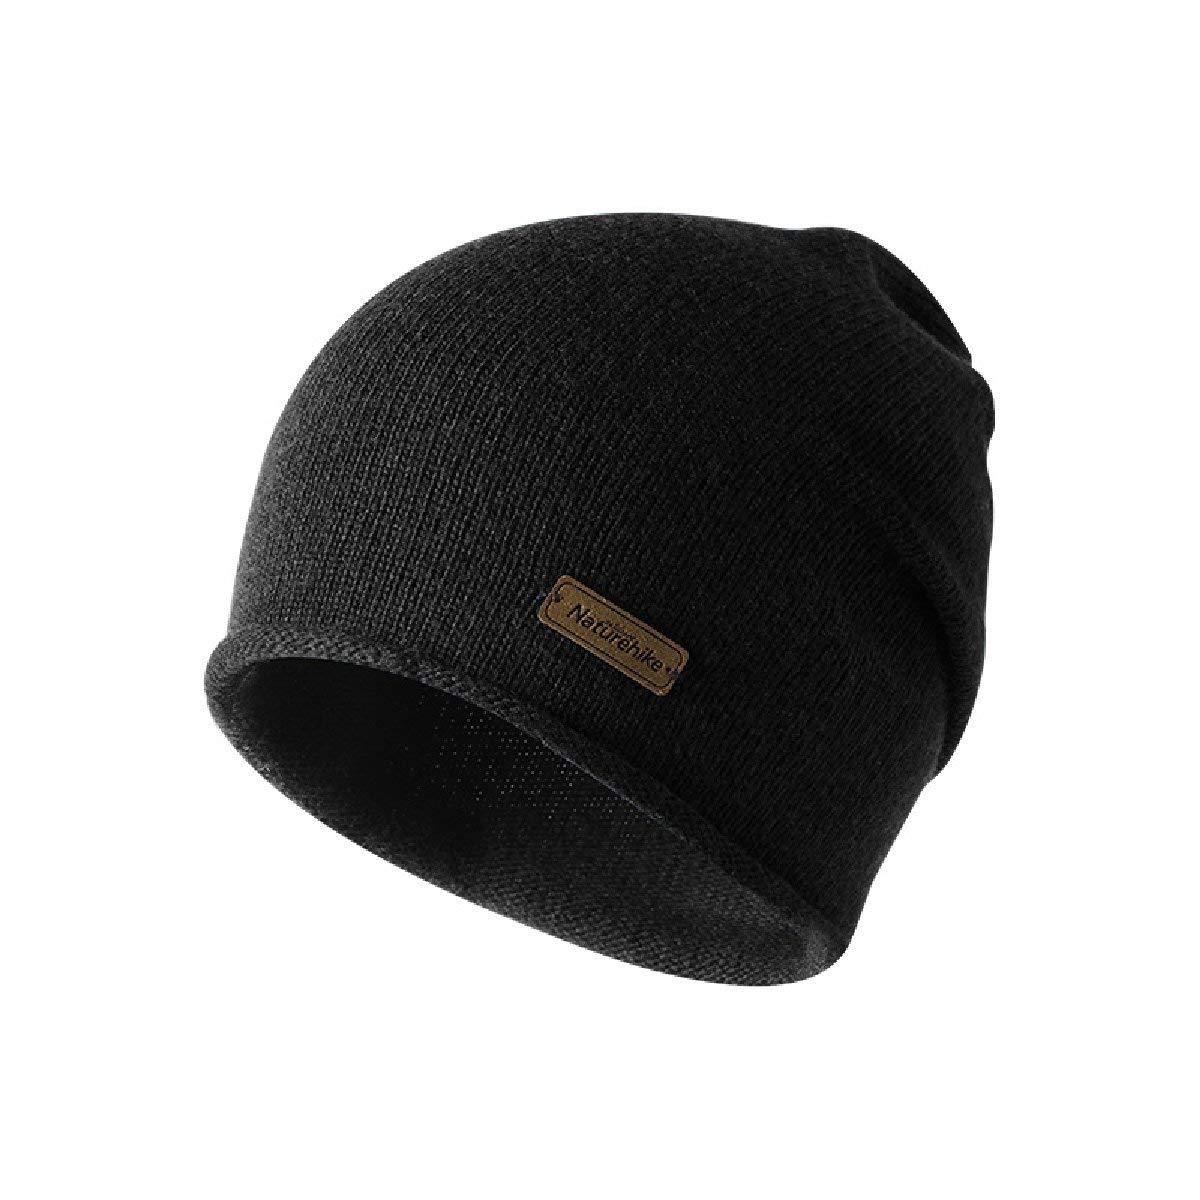 3ccddff0665e Get Quotations · TRIWONDER Knit Hat Beanie Skull Cap Watch Hat Wool Winter  Warm Hat for Men Women